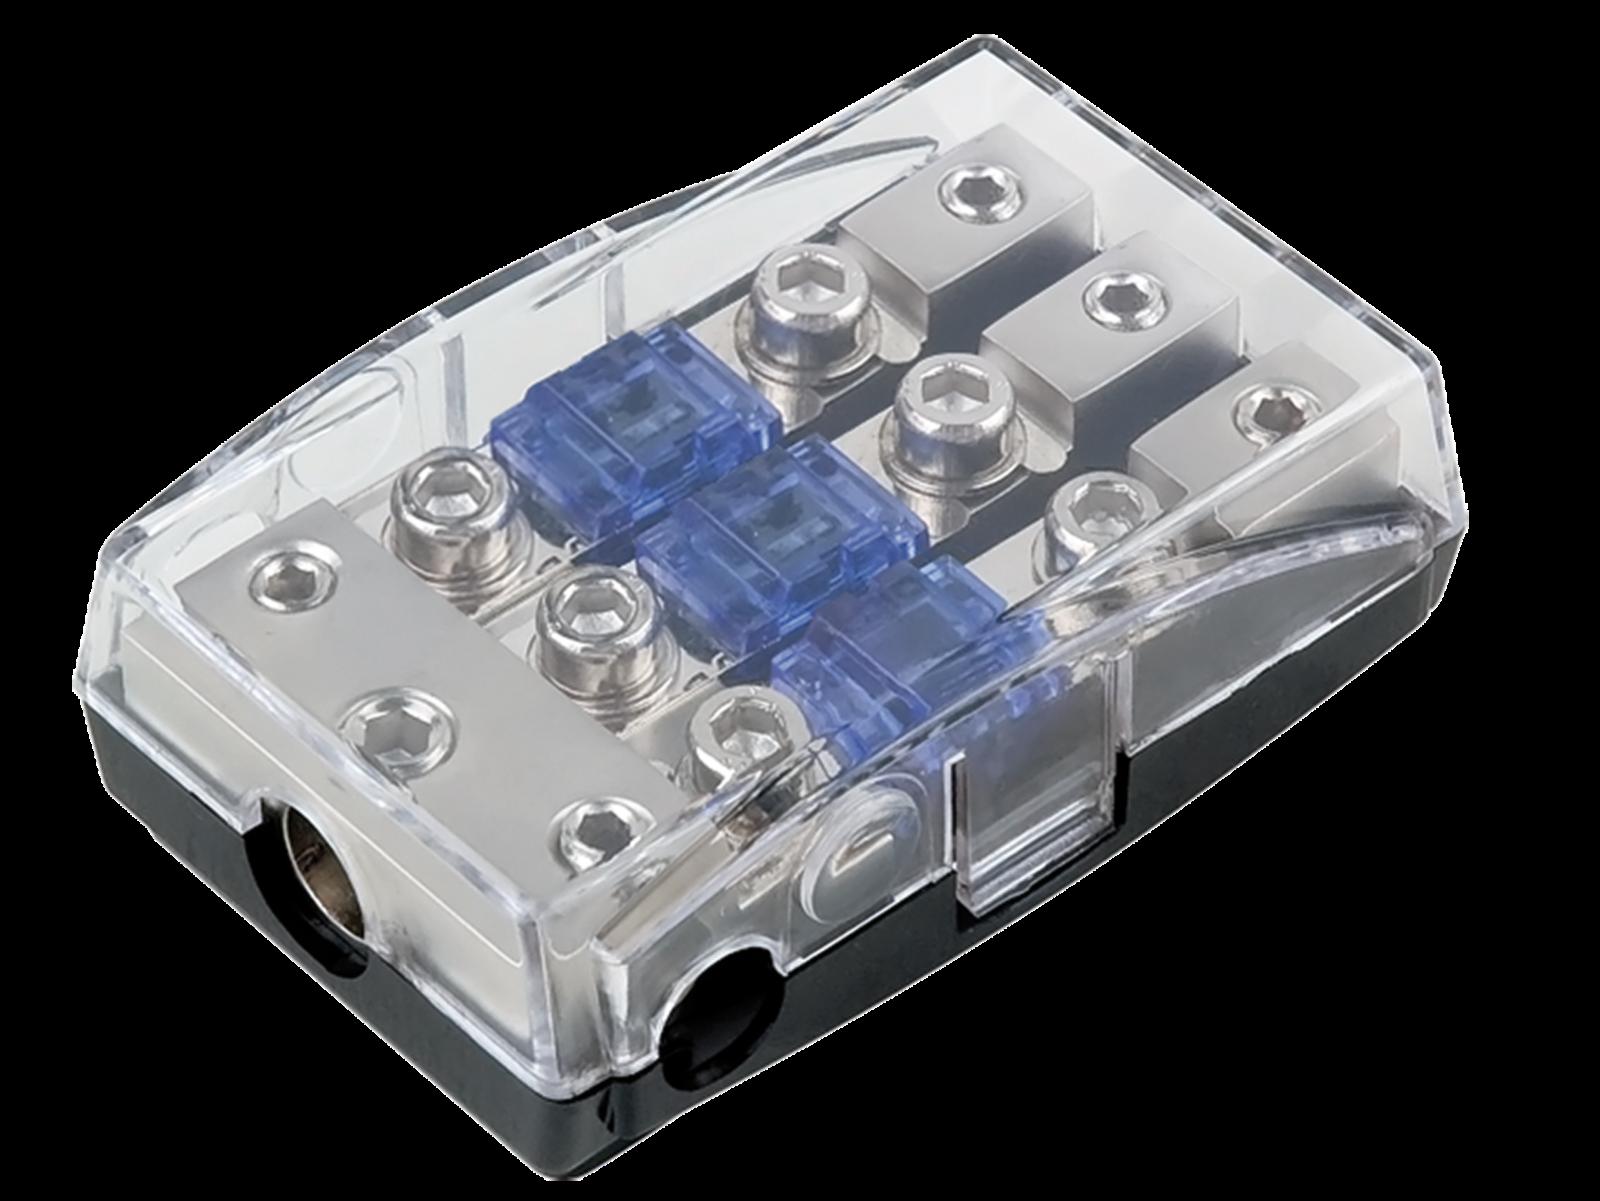 Mini ANL Sicherungshalter (silber) 1 x 35 mm² + 2 x 20 mm²